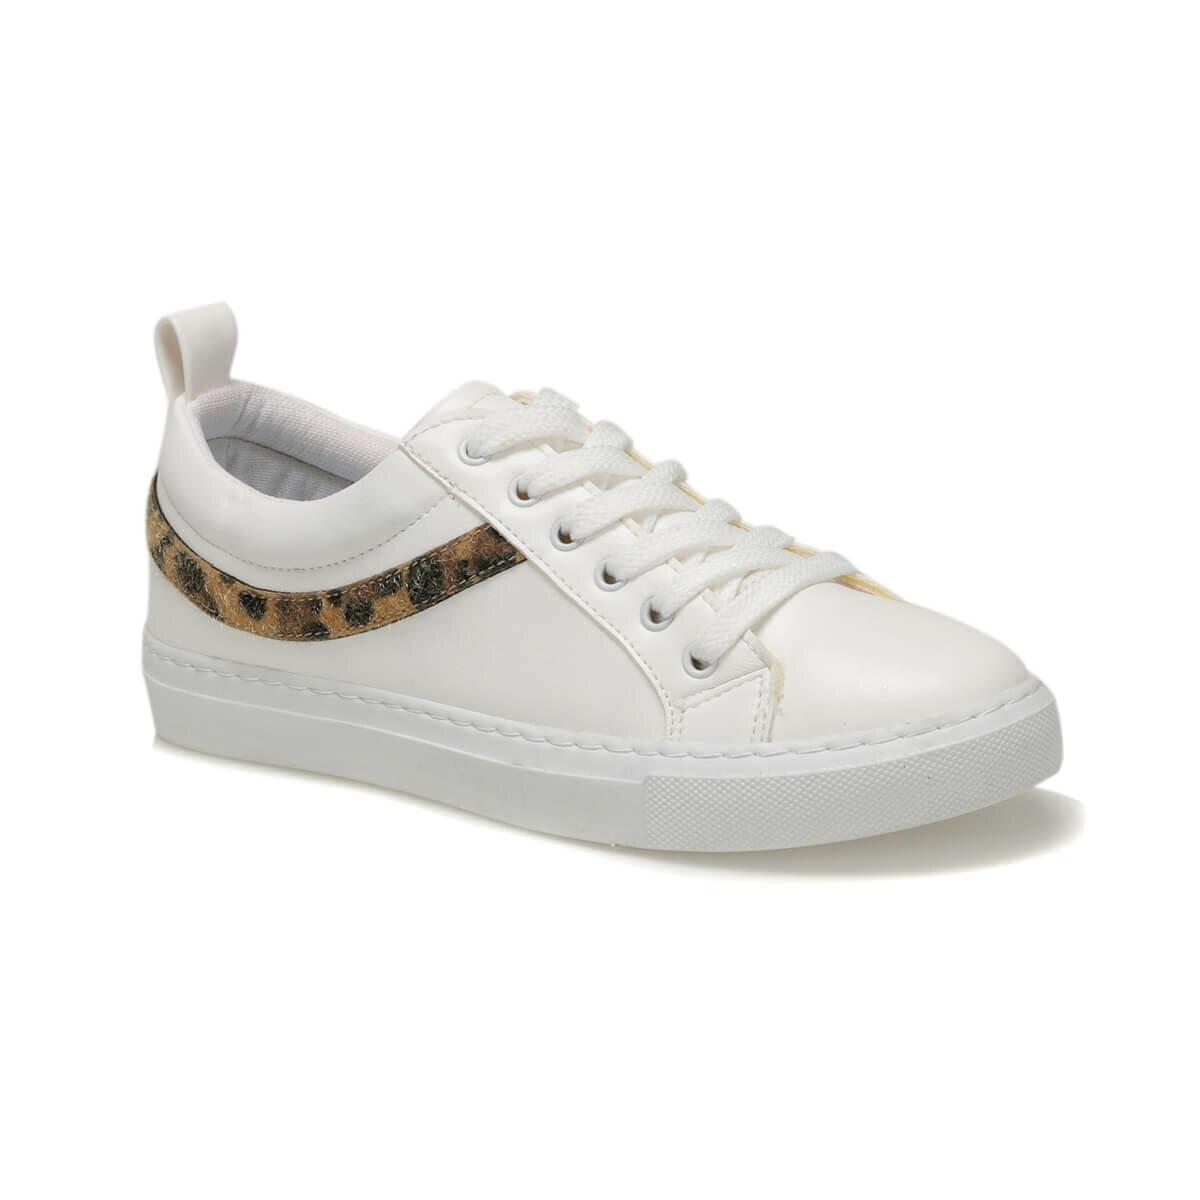 FLO CW19001 White Women 'S Sneaker Shoes Art Bella